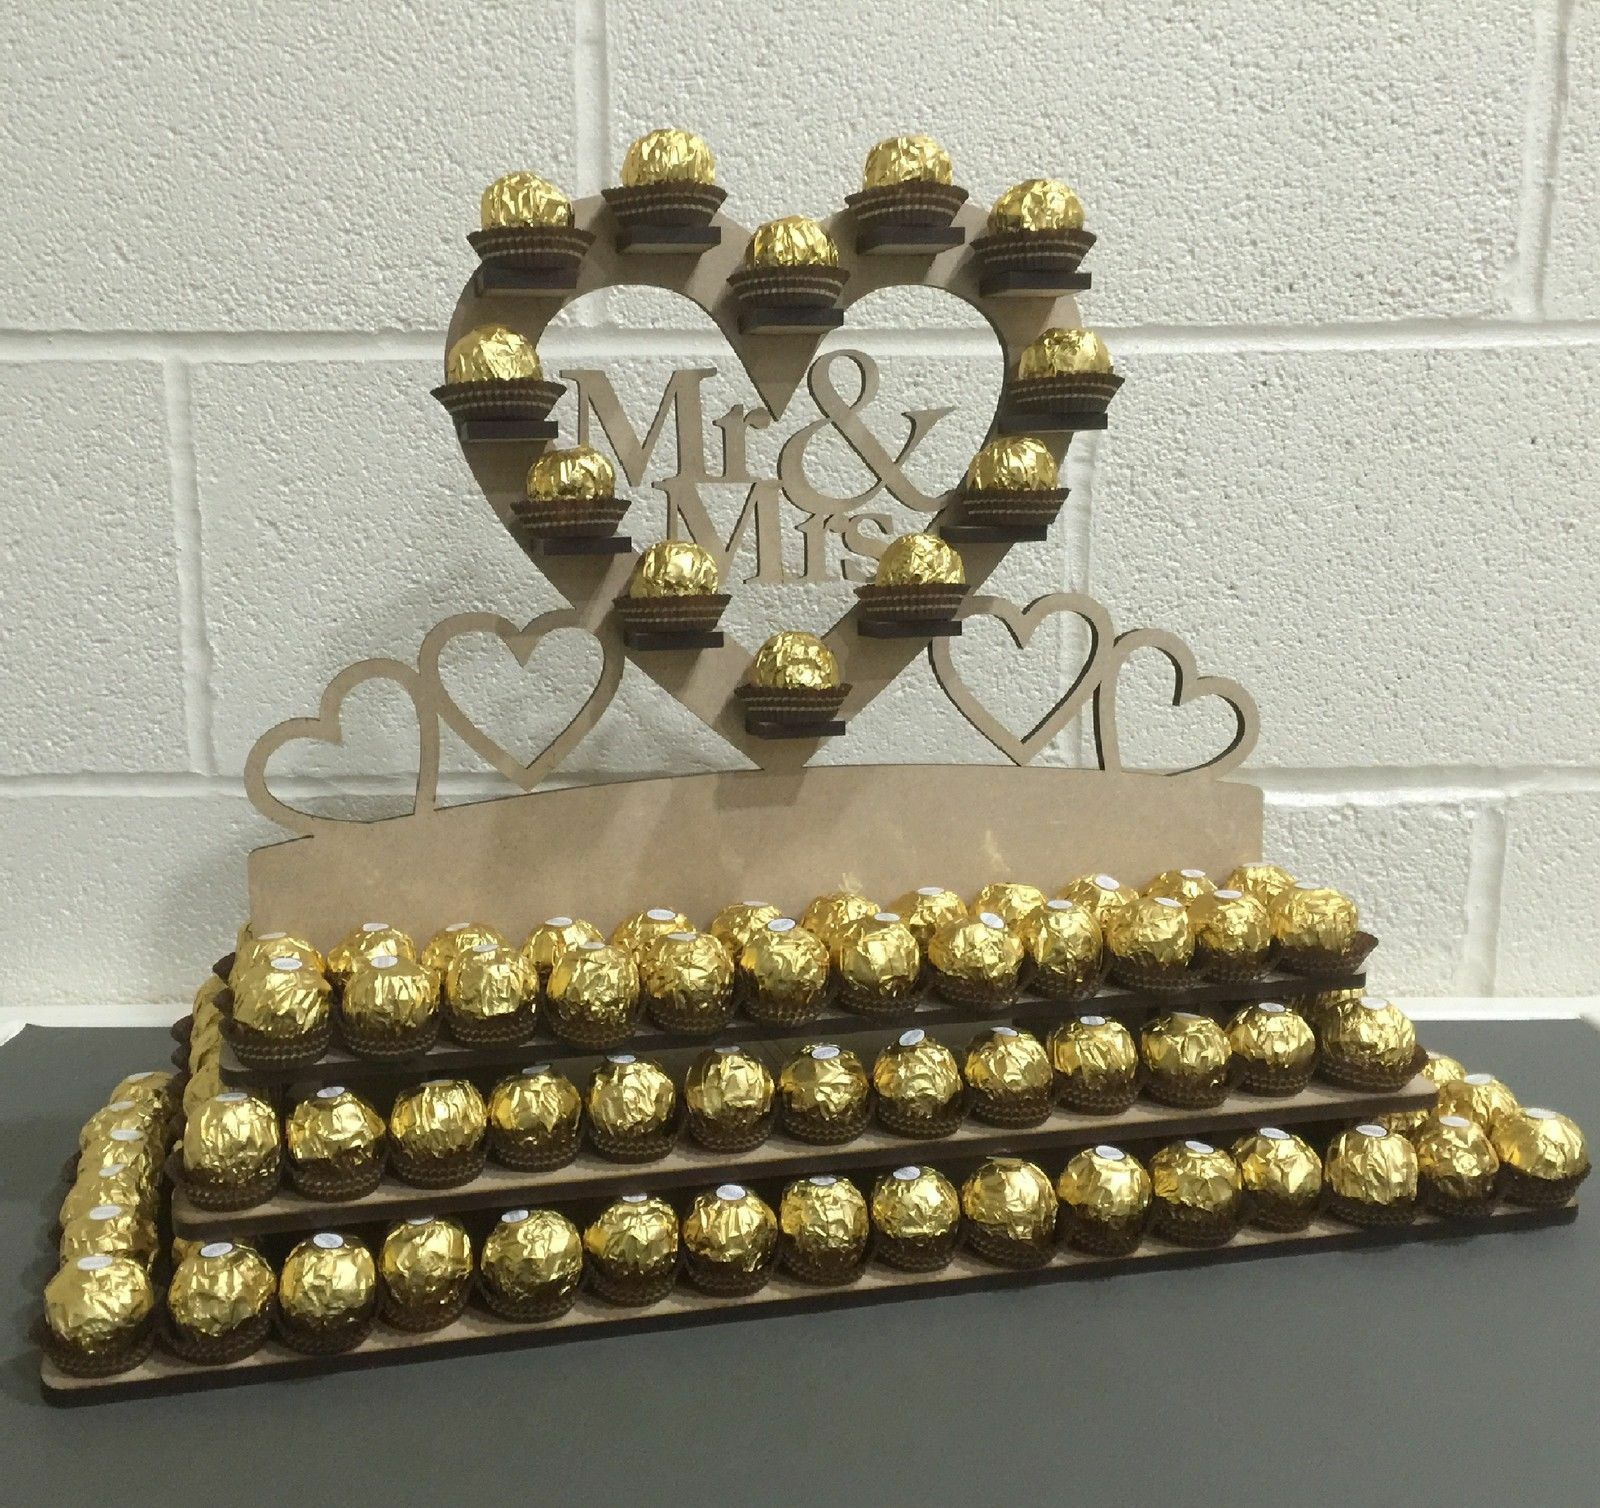 Y10 148x Ferrero Rocher Chocolate Pyramid Wedding Centre Display Stand Mr & Mrs